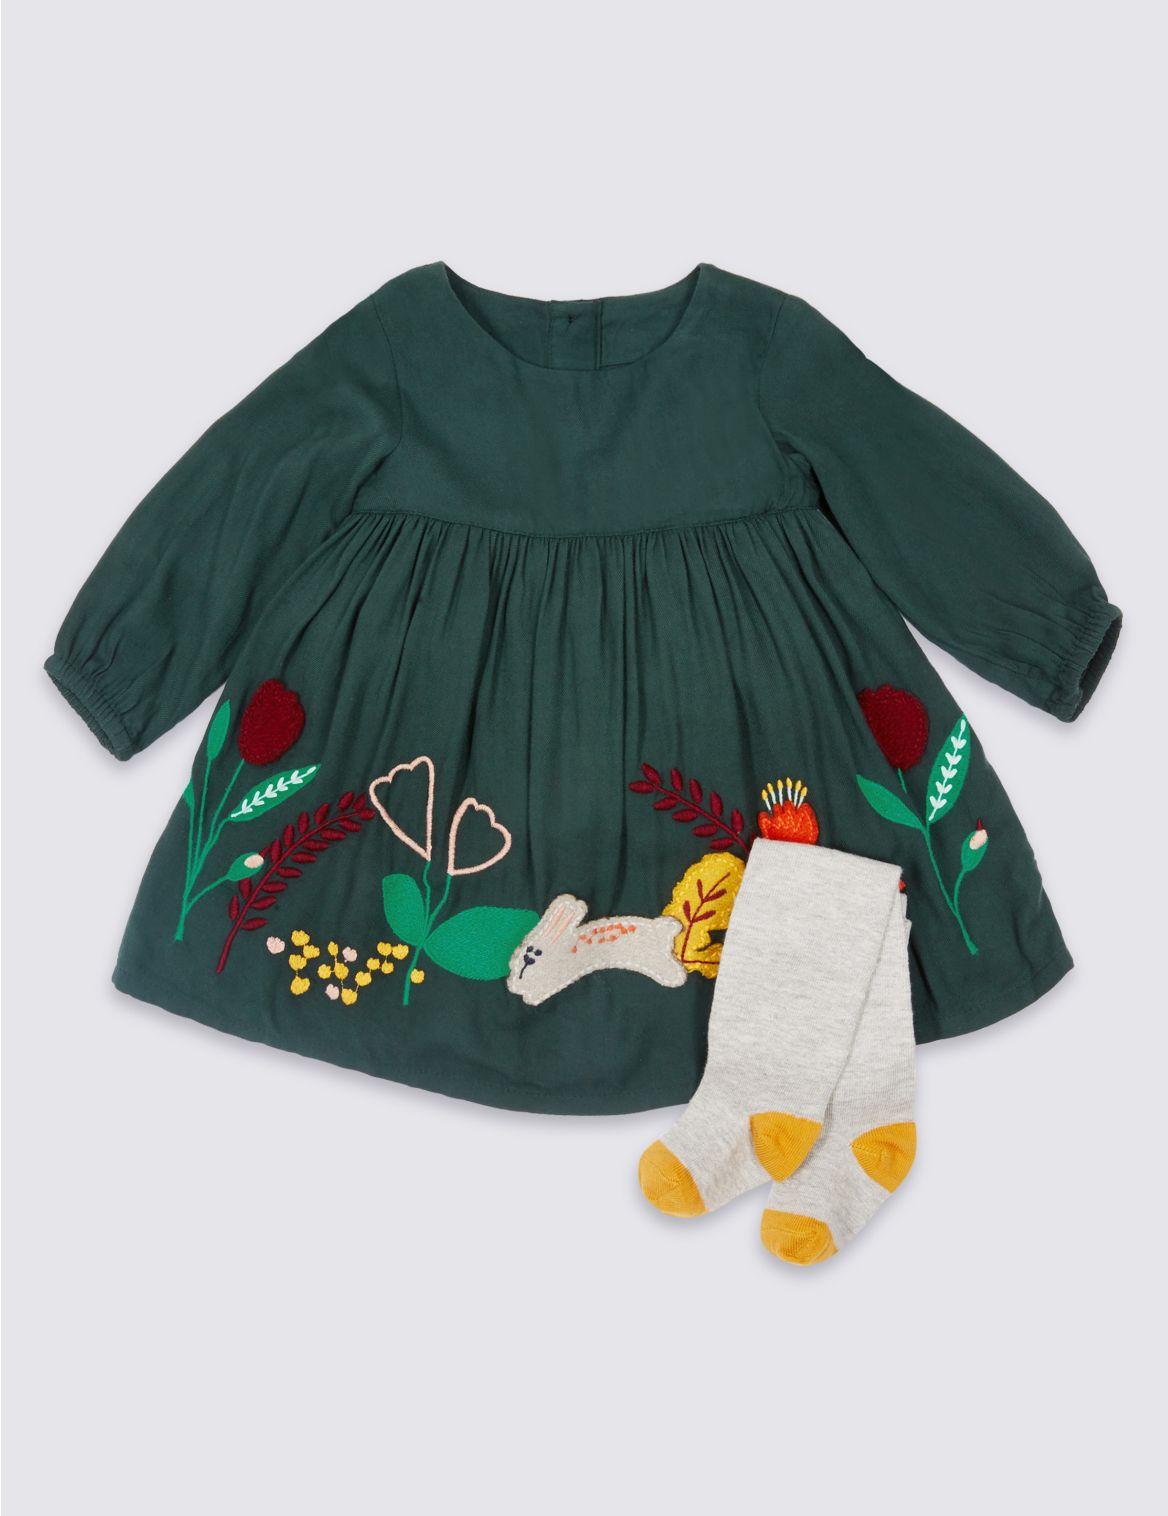 2delige outfit met jurkje met